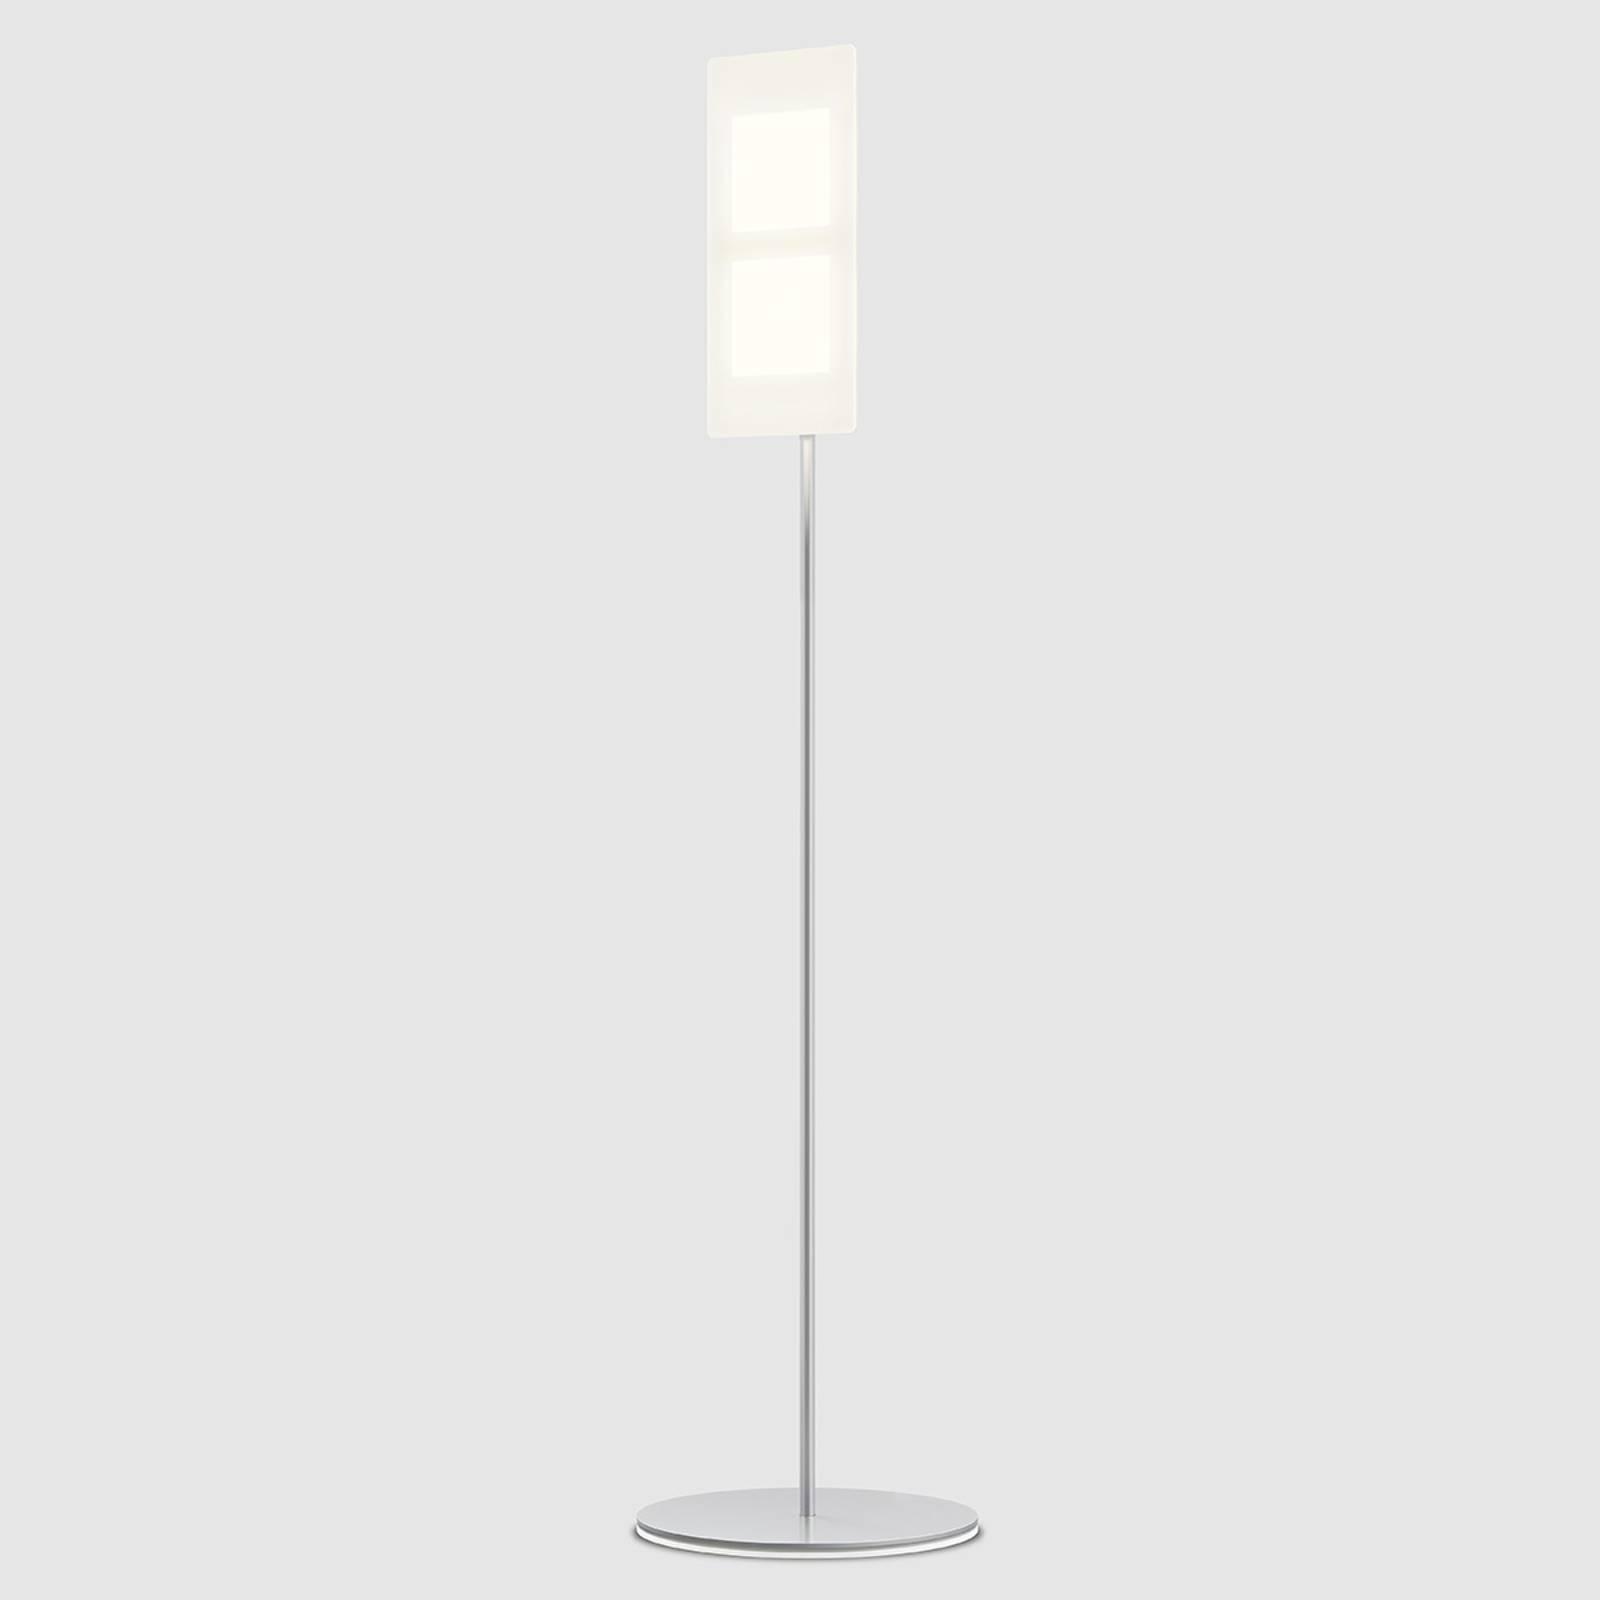 Avec OLED - lampadaire OMLED One f2 blanc